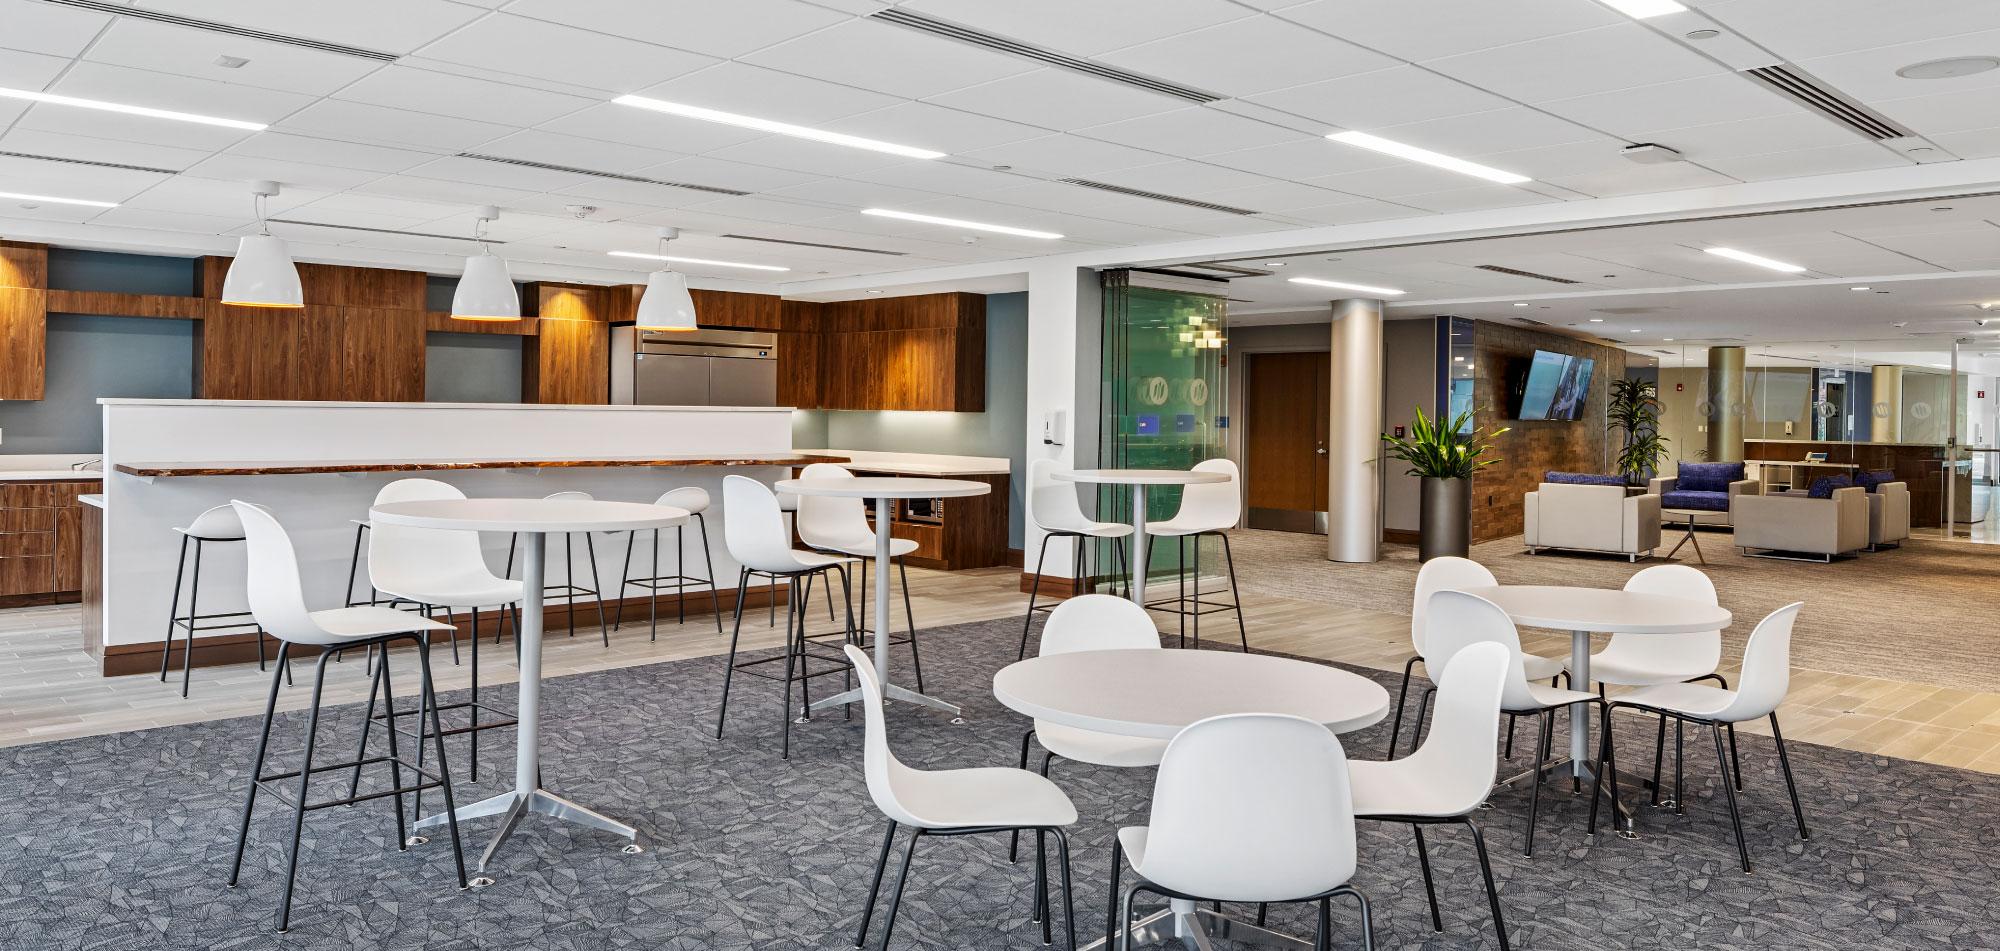 Workers Credit Union Corporate Interior Design